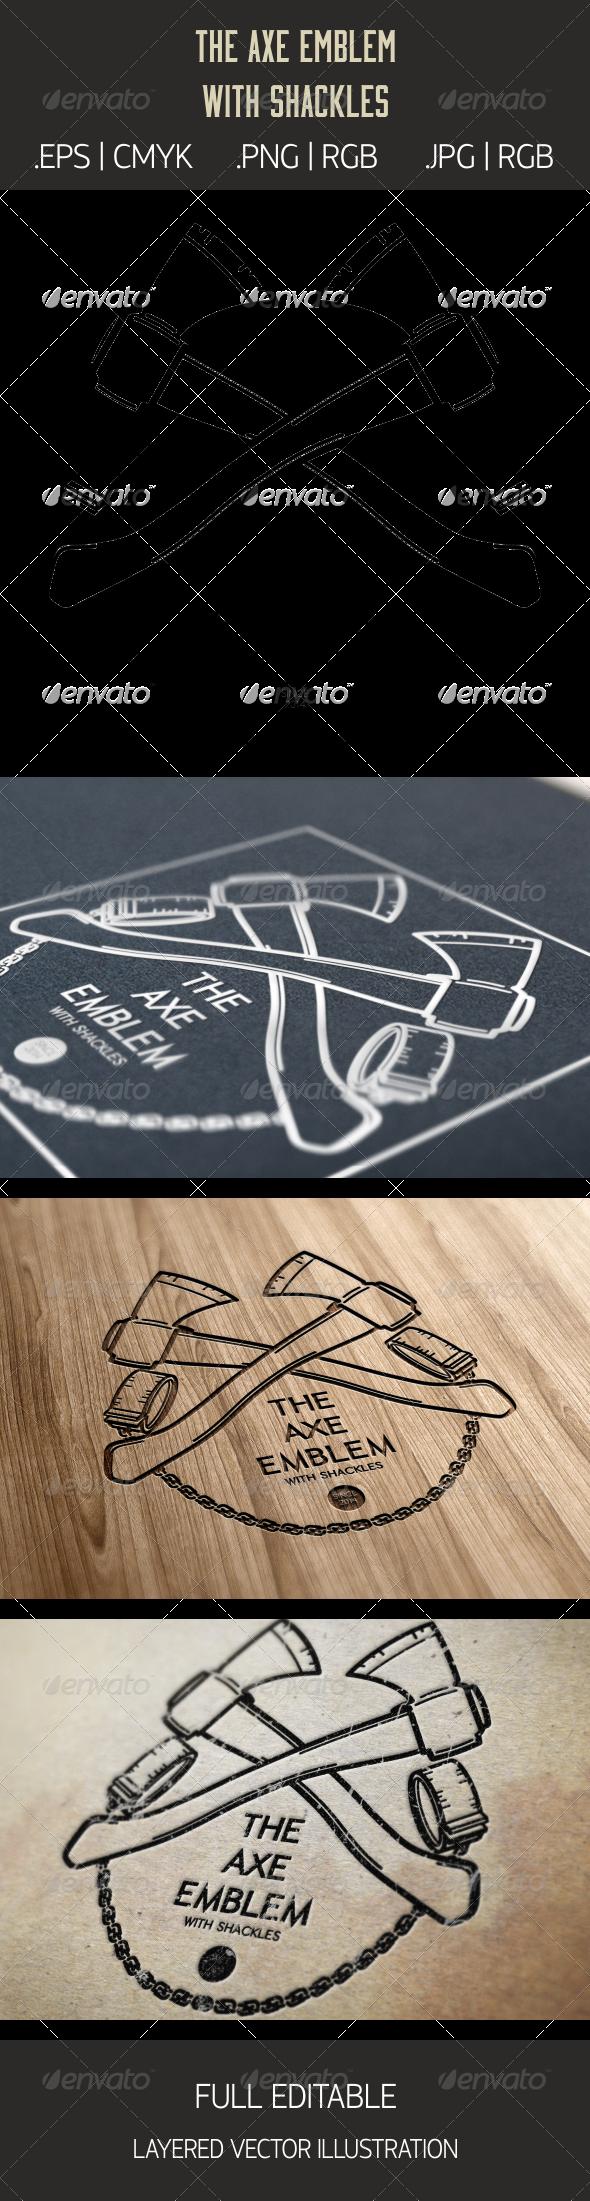 picture Vector emblem retro design element. Realistic graphic download ai